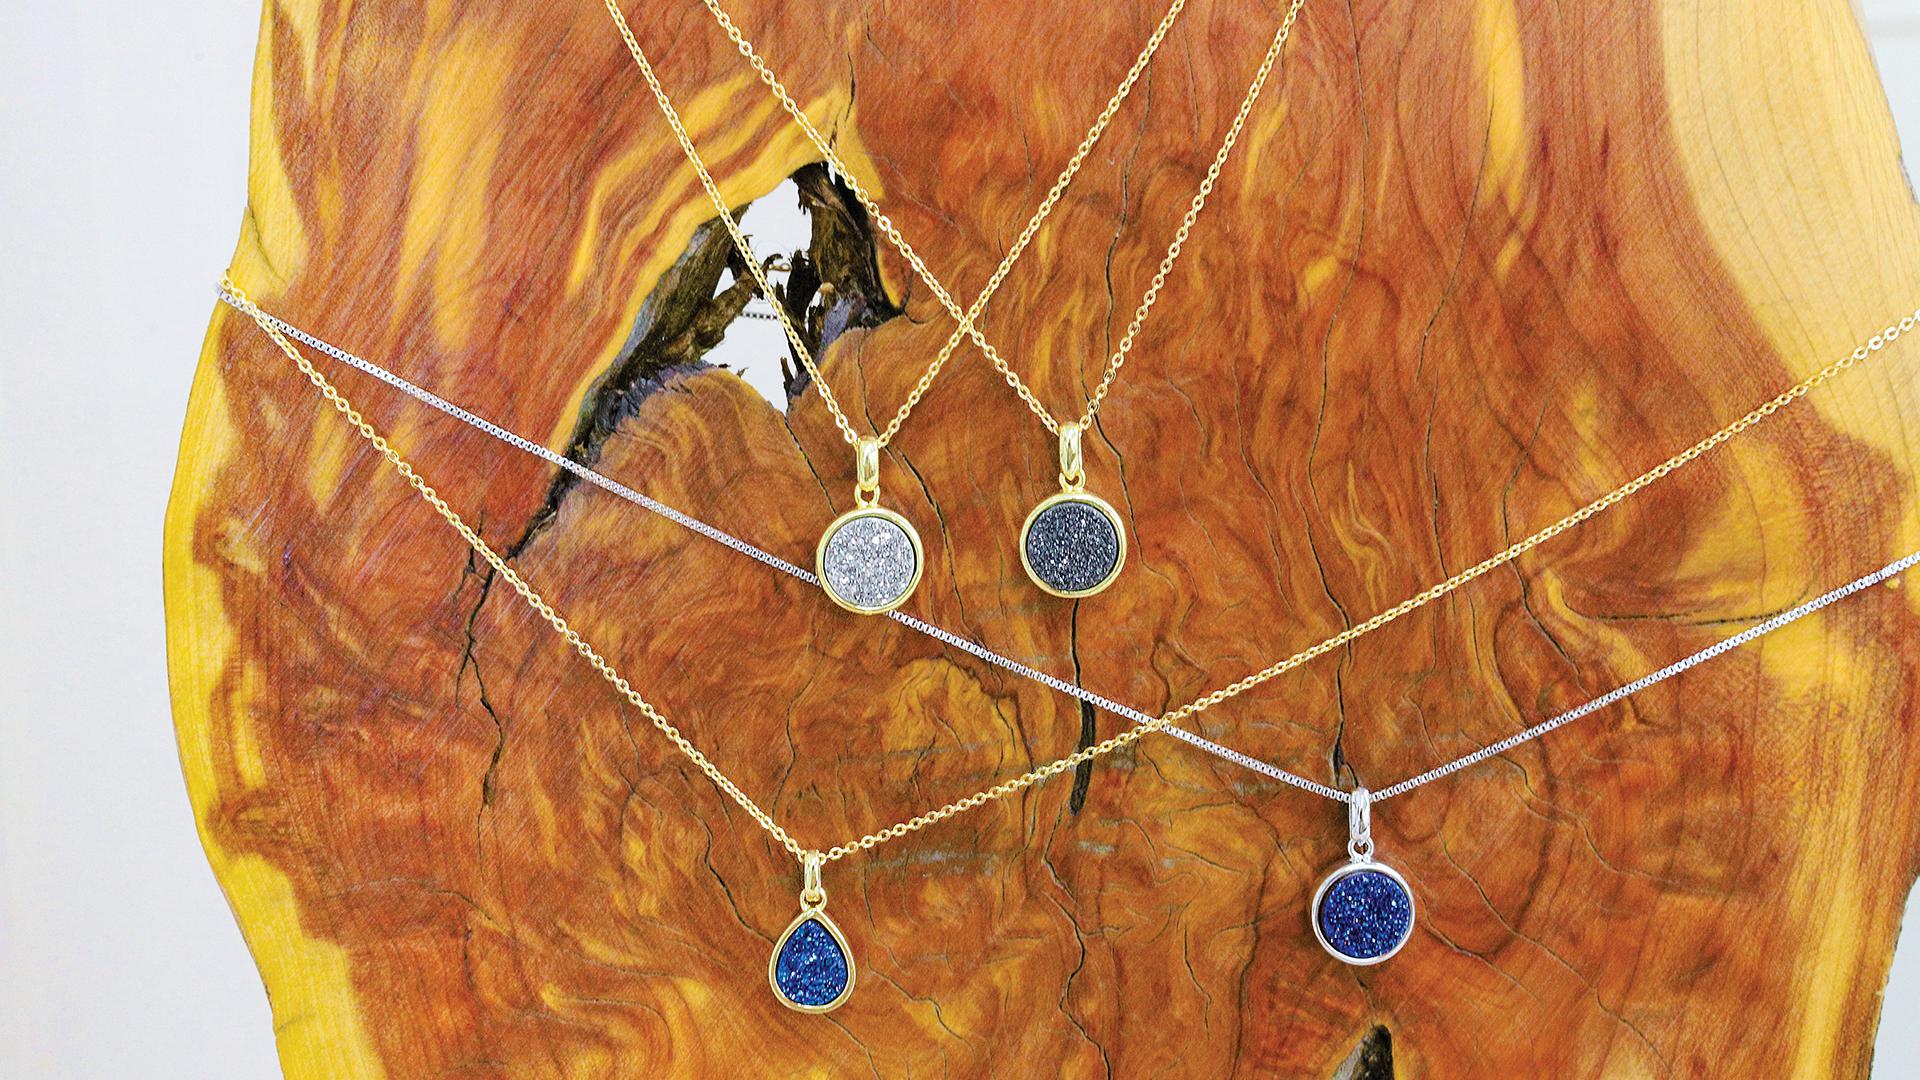 highlands-nc-shopping-bijou-necklaces